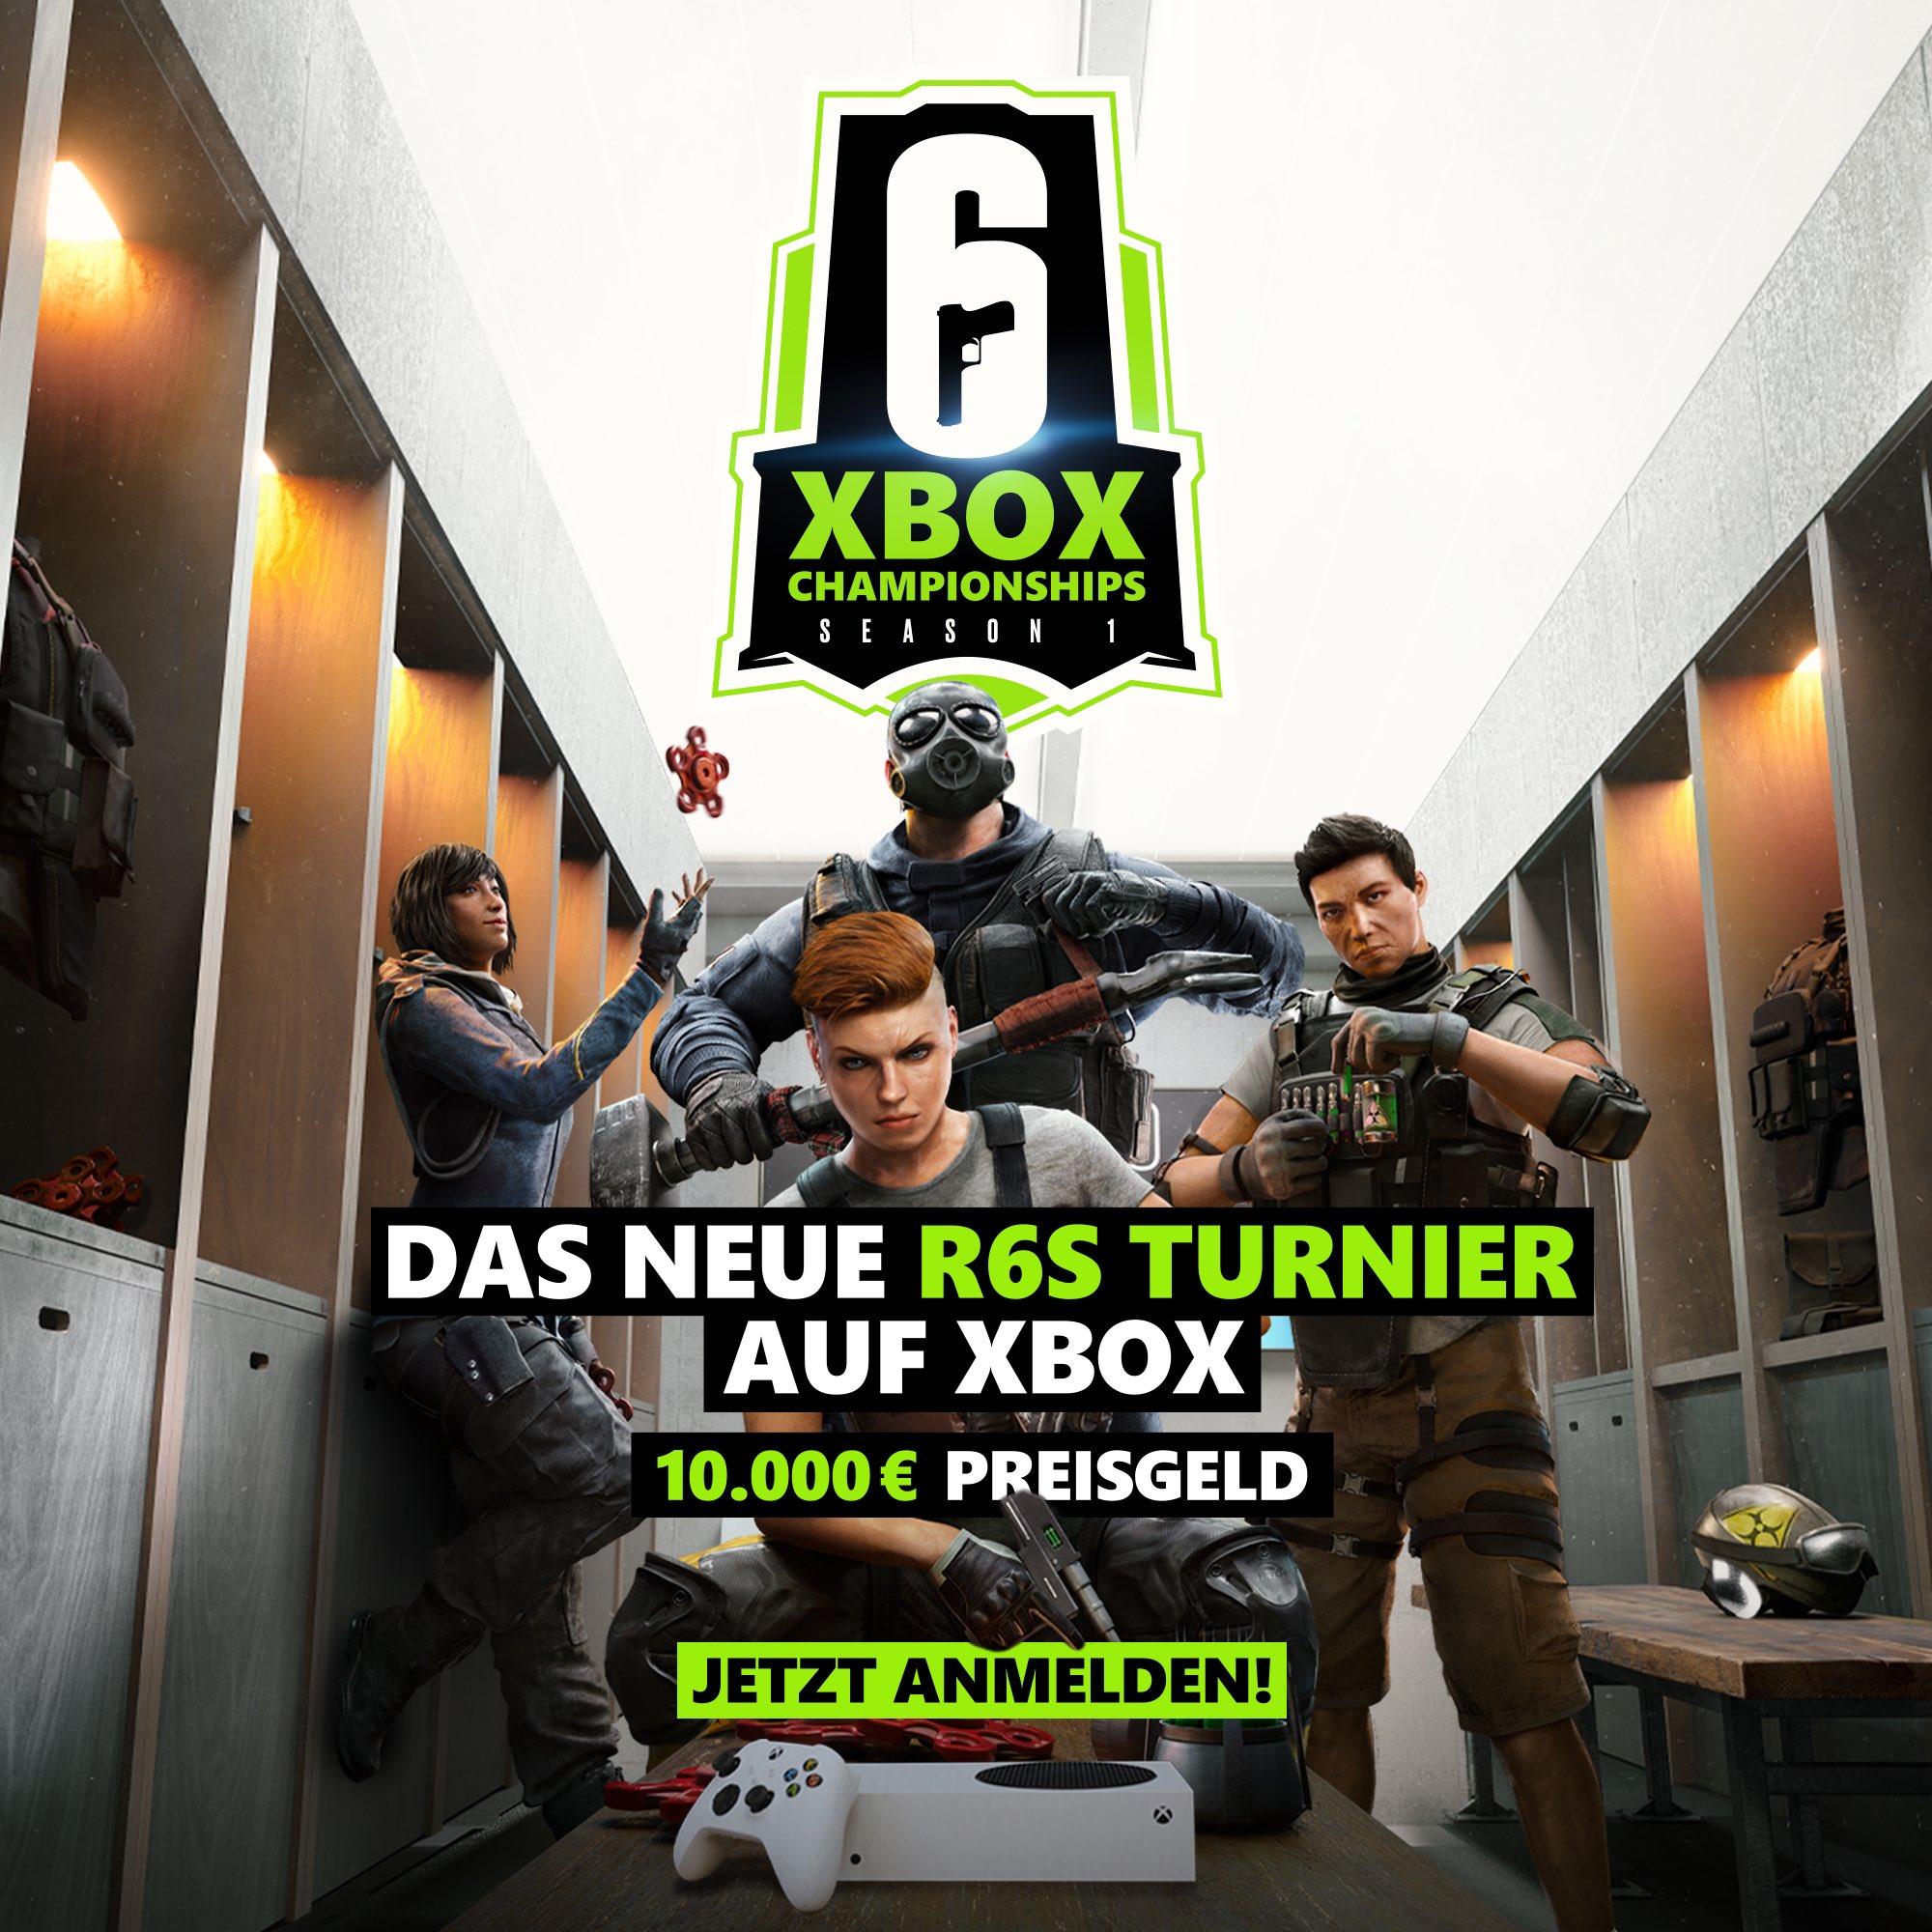 News Grafik Xbox Championships Season 1 in Rainbow Six: Siege - Nachbericht